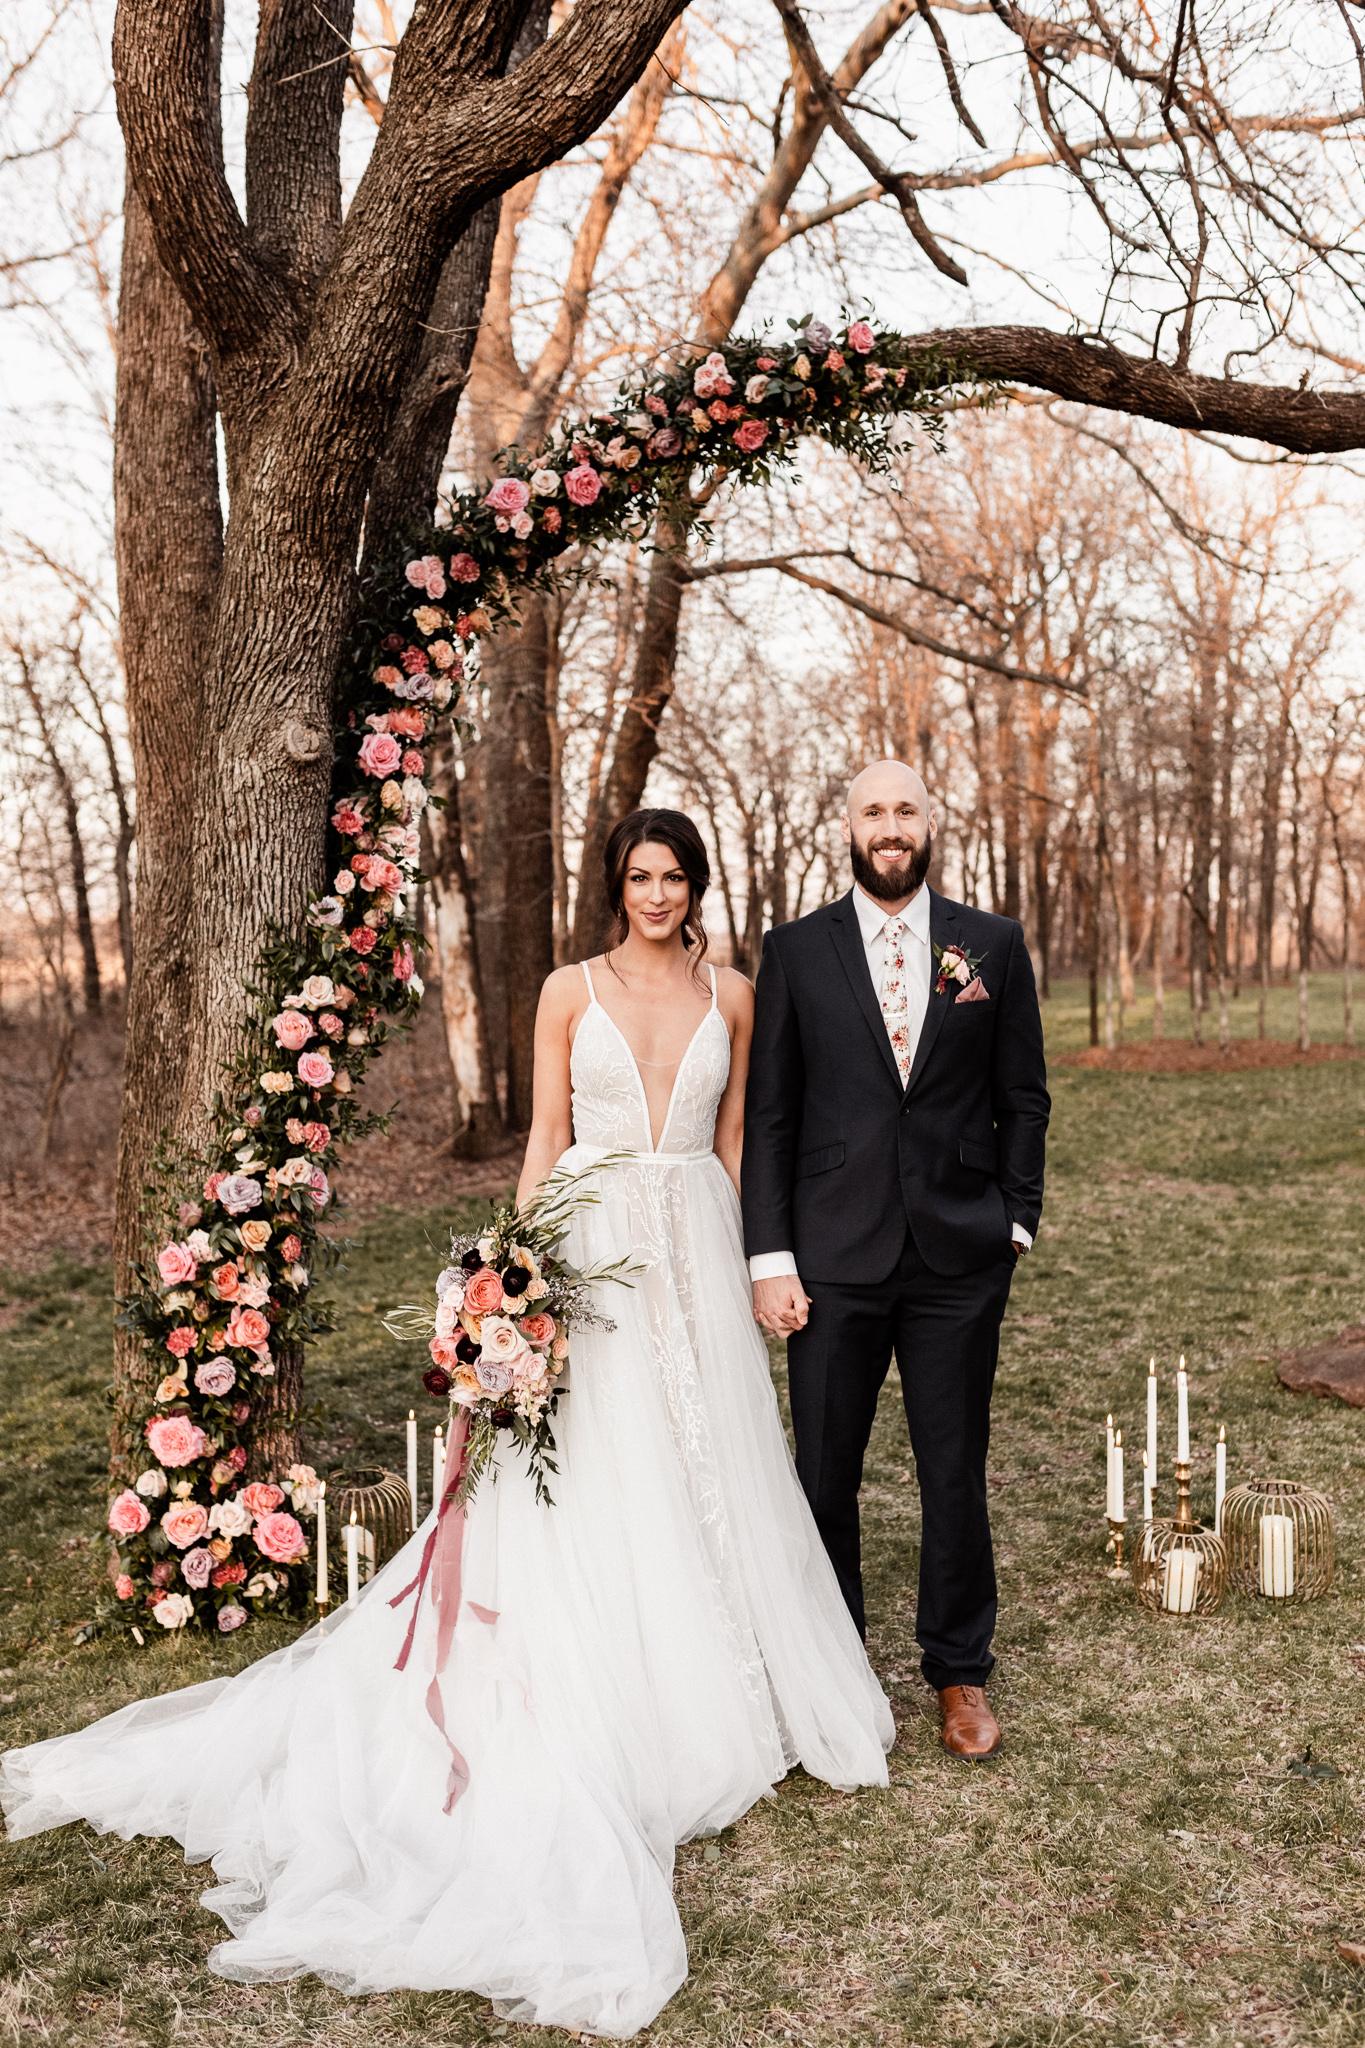 Cultivate Event Planning Styled Shoot   Colorful Romantic Barn Wedding Inspo   Oklahoma Wedding Photographer-91.jpg